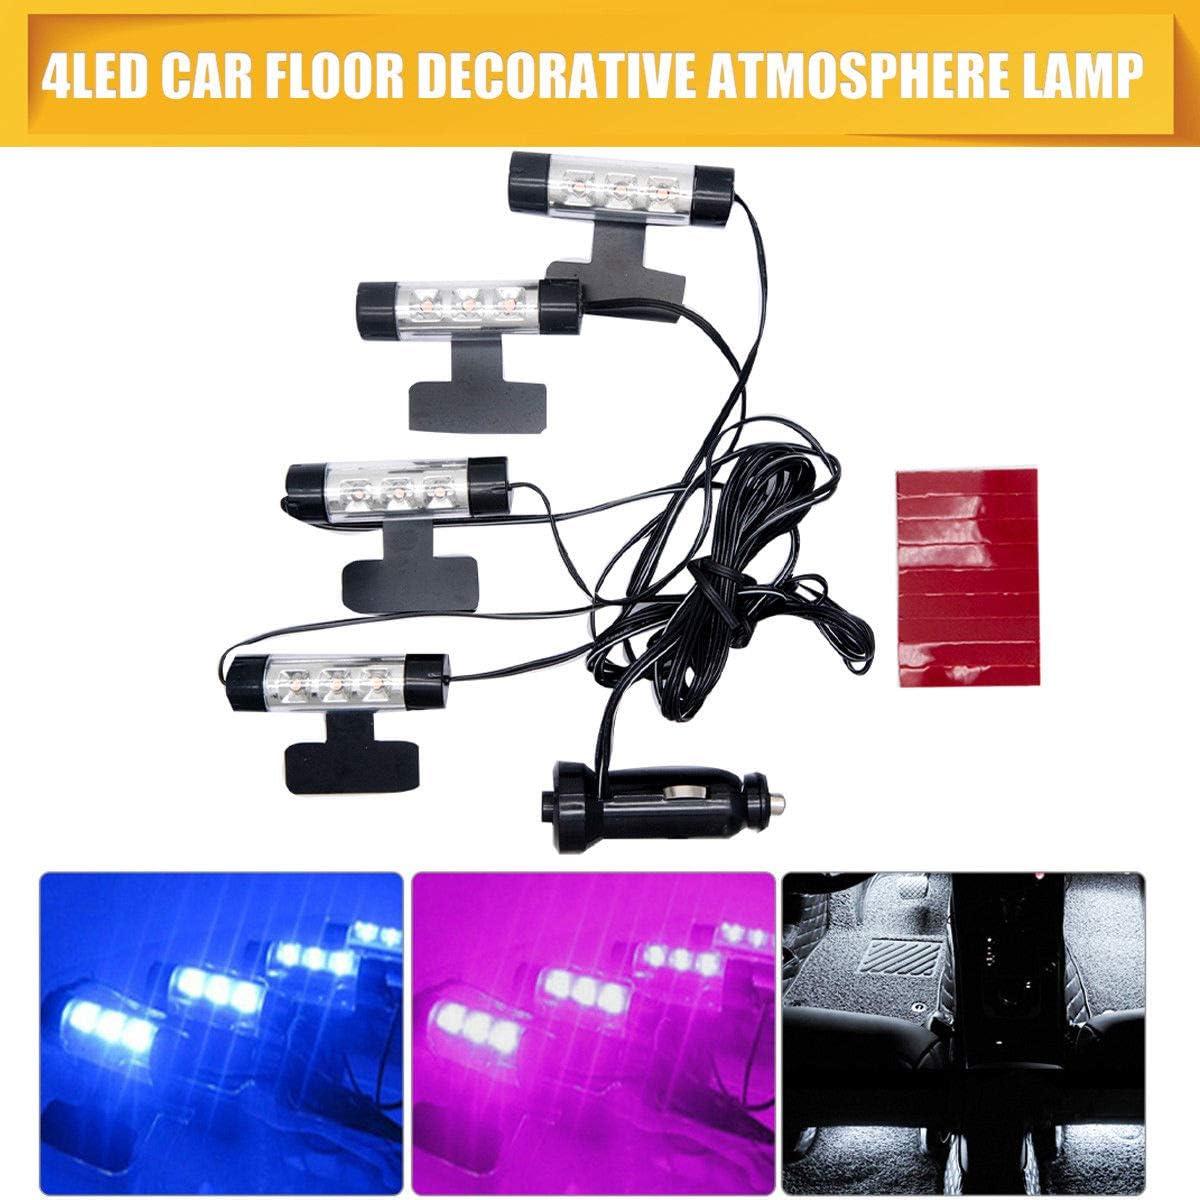 3 LED 12 V auto carica Glow interno decorativo 4 in1 Atmosphere luce viola Auto Atmosphere lampada piede Atmosfera interna lampade decorative Atmosphere Neon Light HugeAuto 4